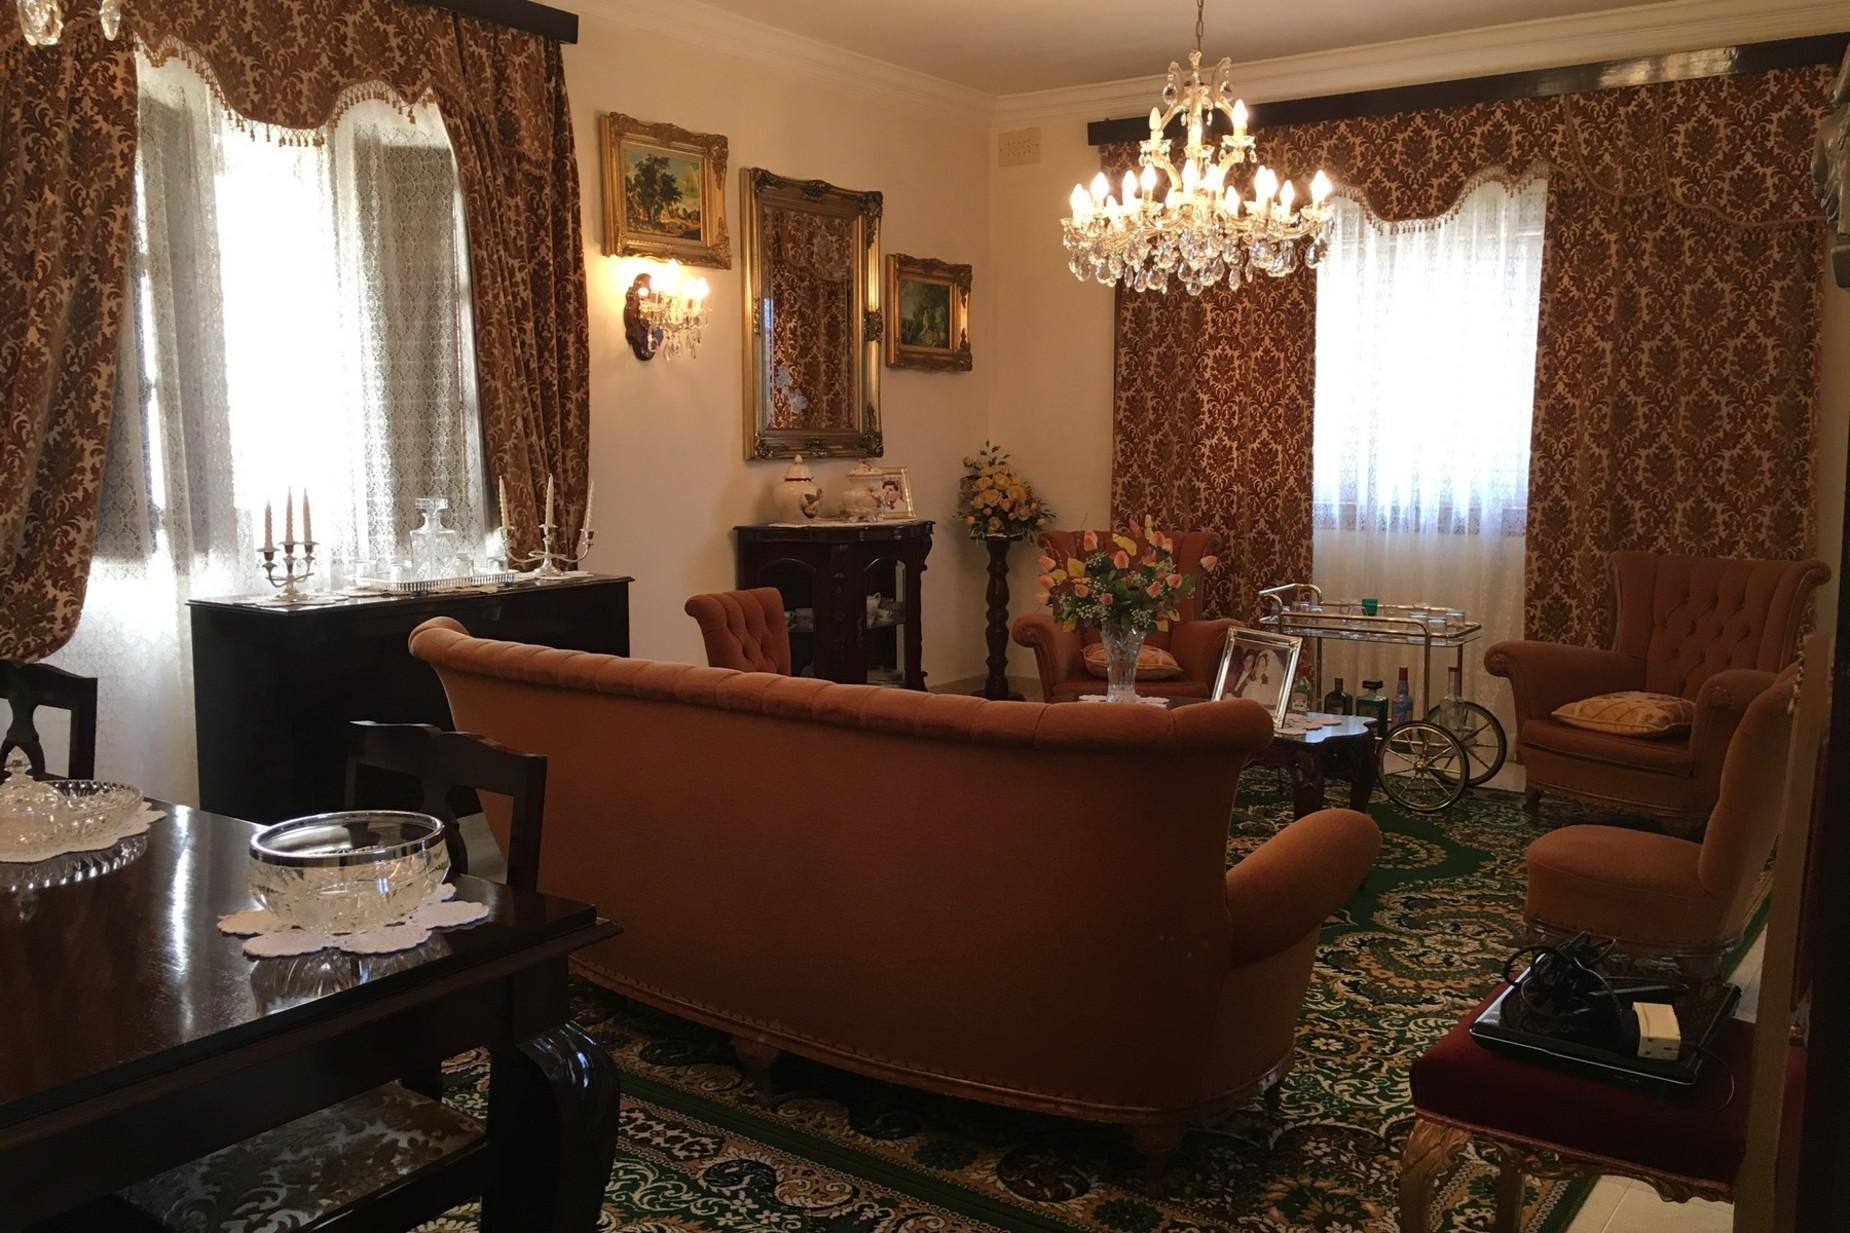 3 bed Villa For Sale in Attard, Attard - thumb 3